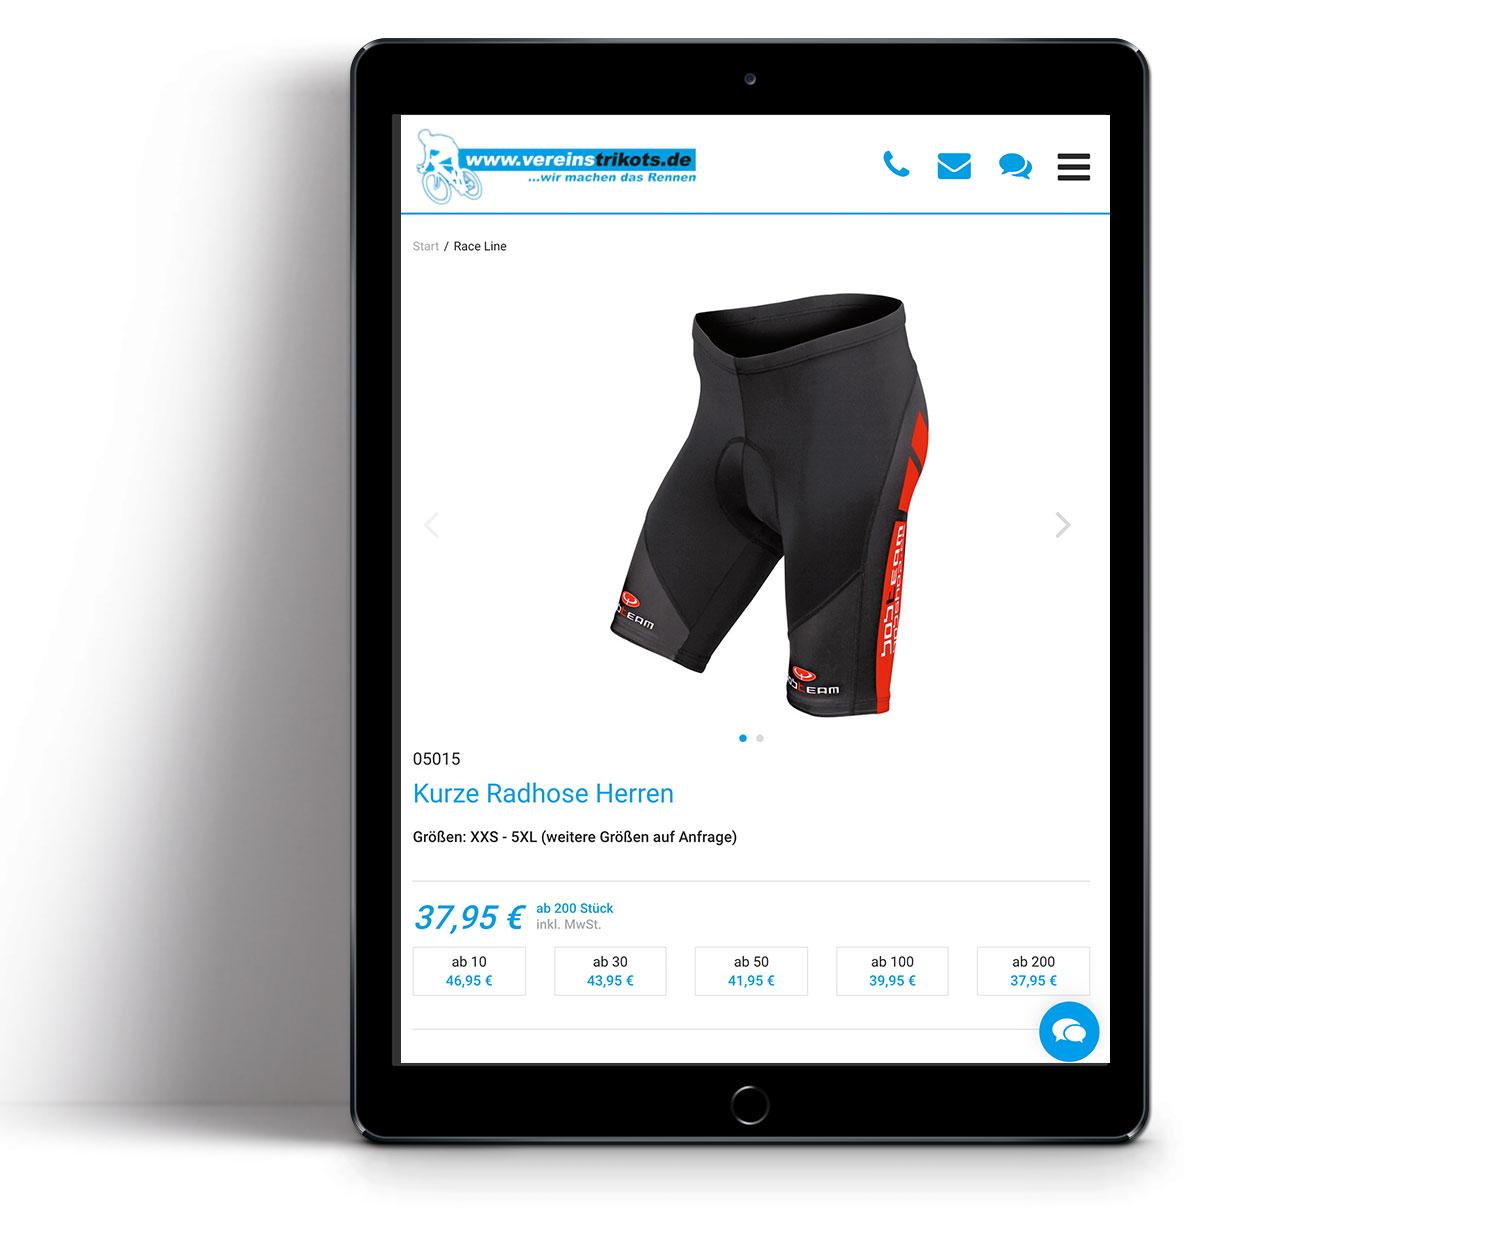 P12-Werbeagentur Heidelberg Referenz-Website-Vereinstrikots Shop tablet02 mobile